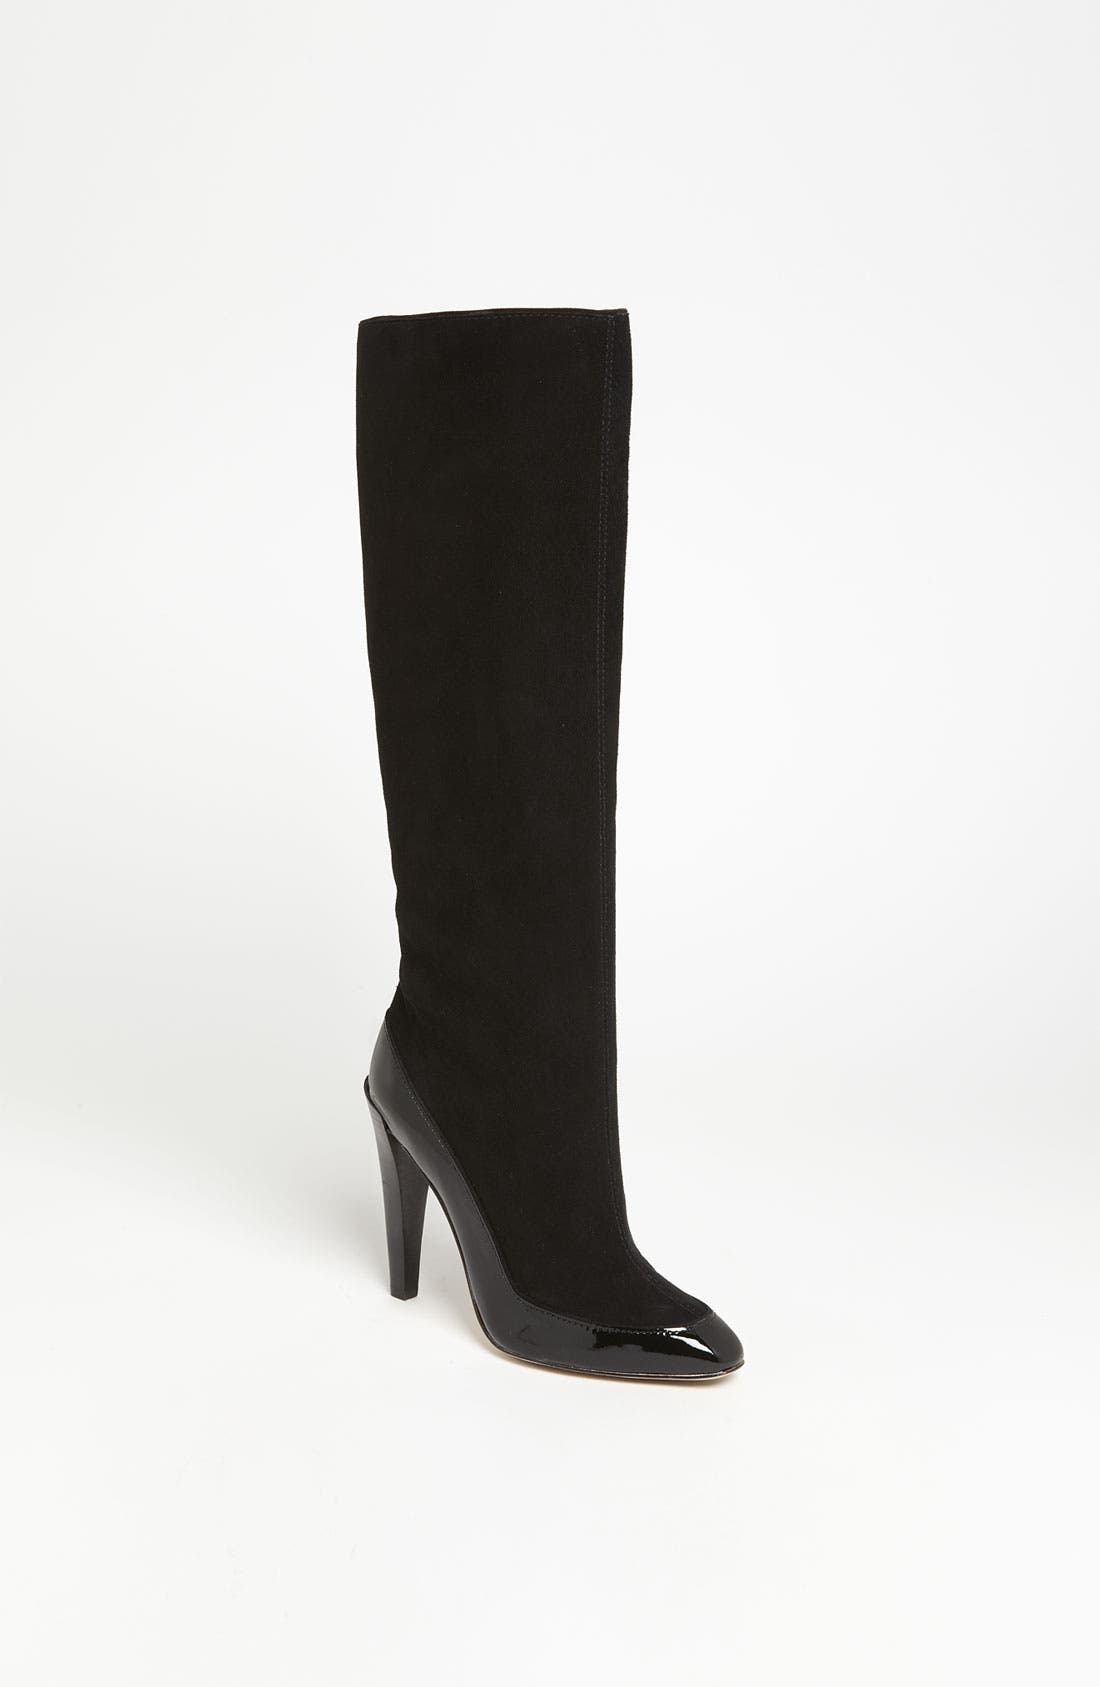 Main Image - Diane von Furstenberg 'Dalad' Over the Knee Boot